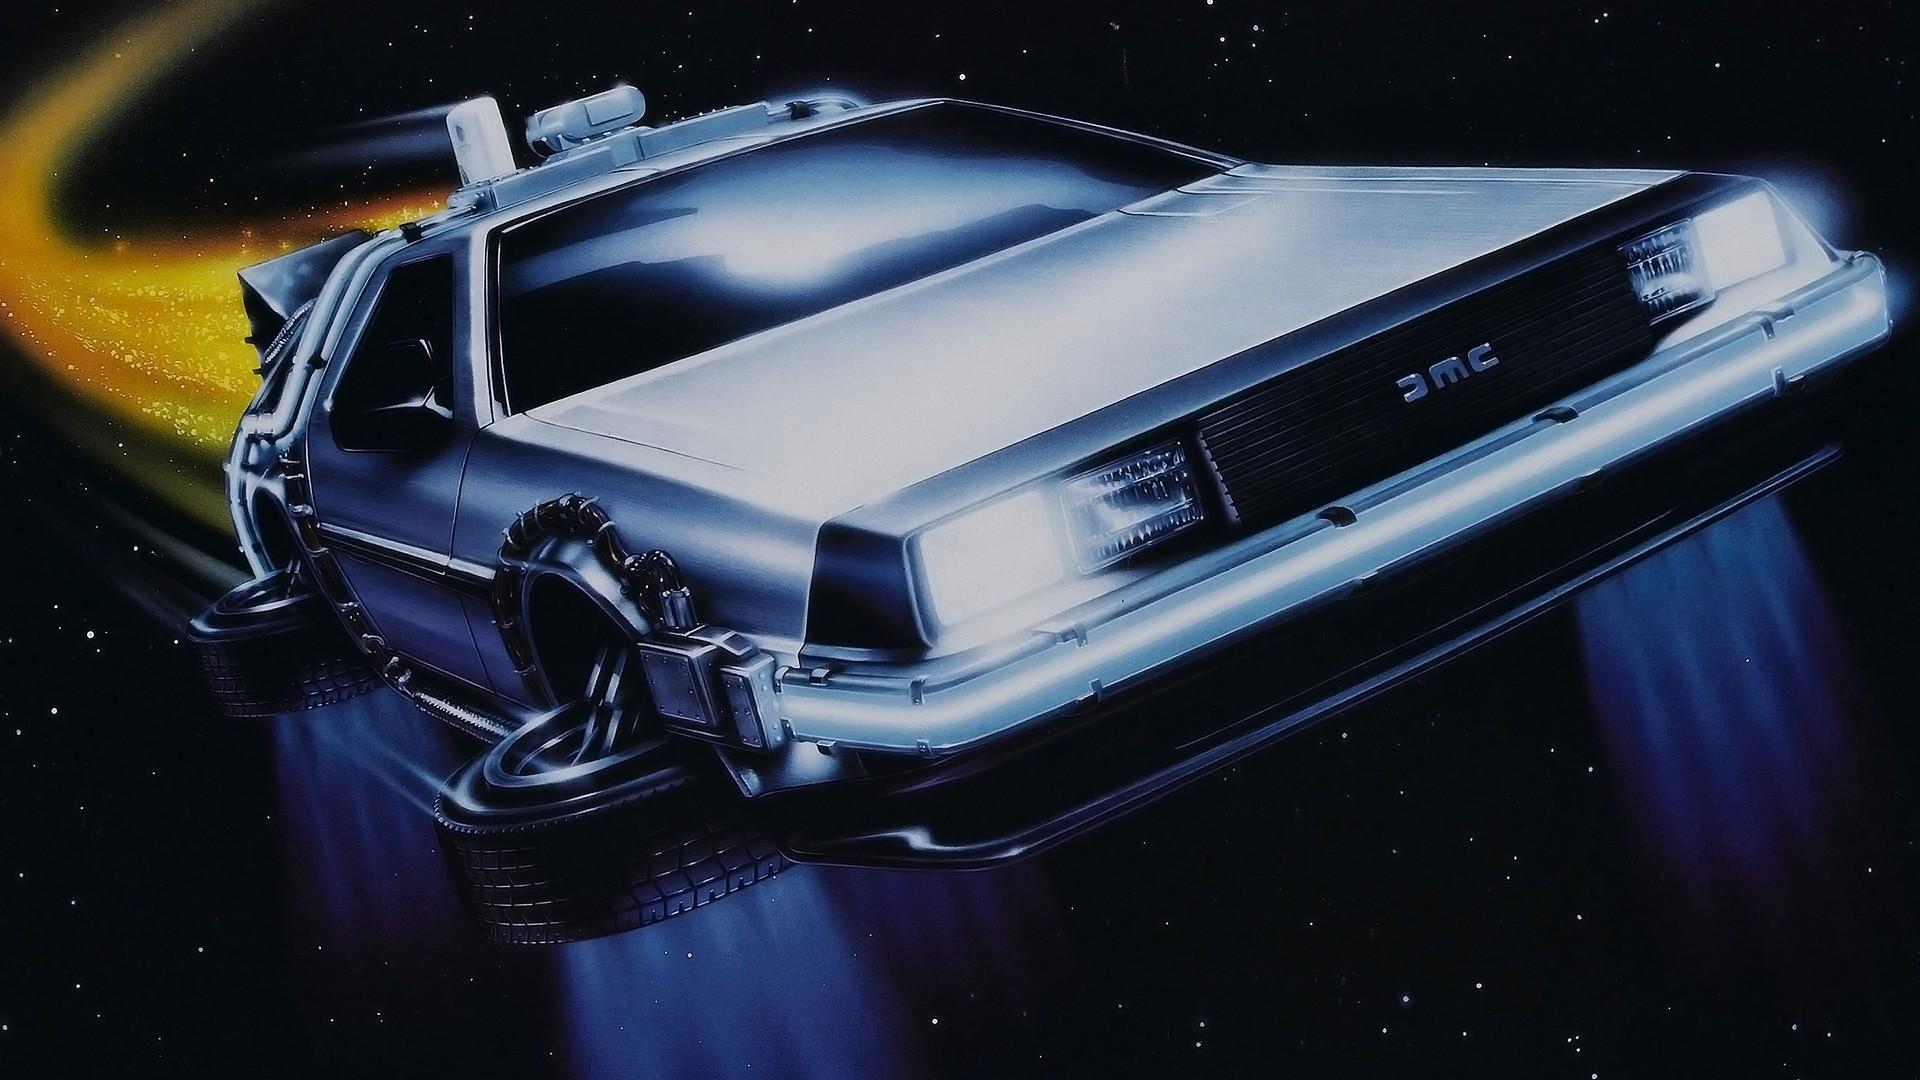 Delorean – Back To The Future HD Unbelievable Wallpaper Free HD .